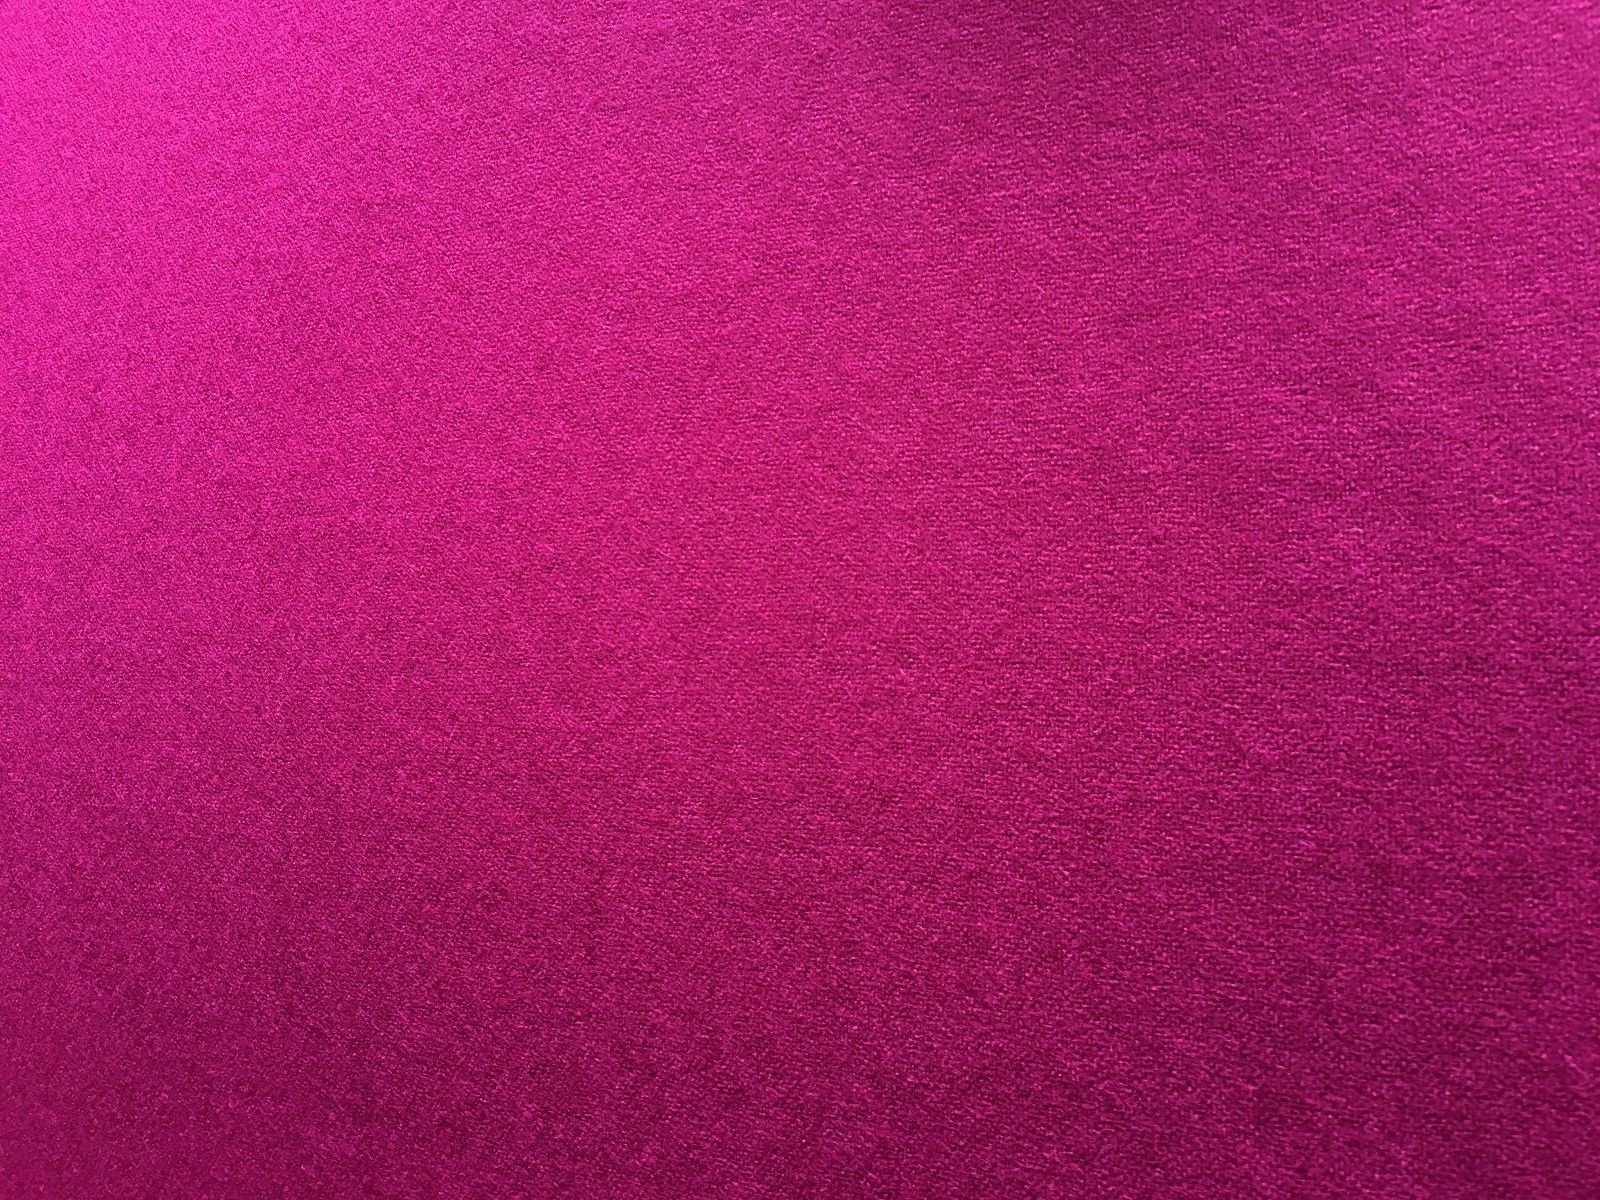 14.75 yds Mid Century Upholstery Fabric Hopsack Fuchsia Wool DXX